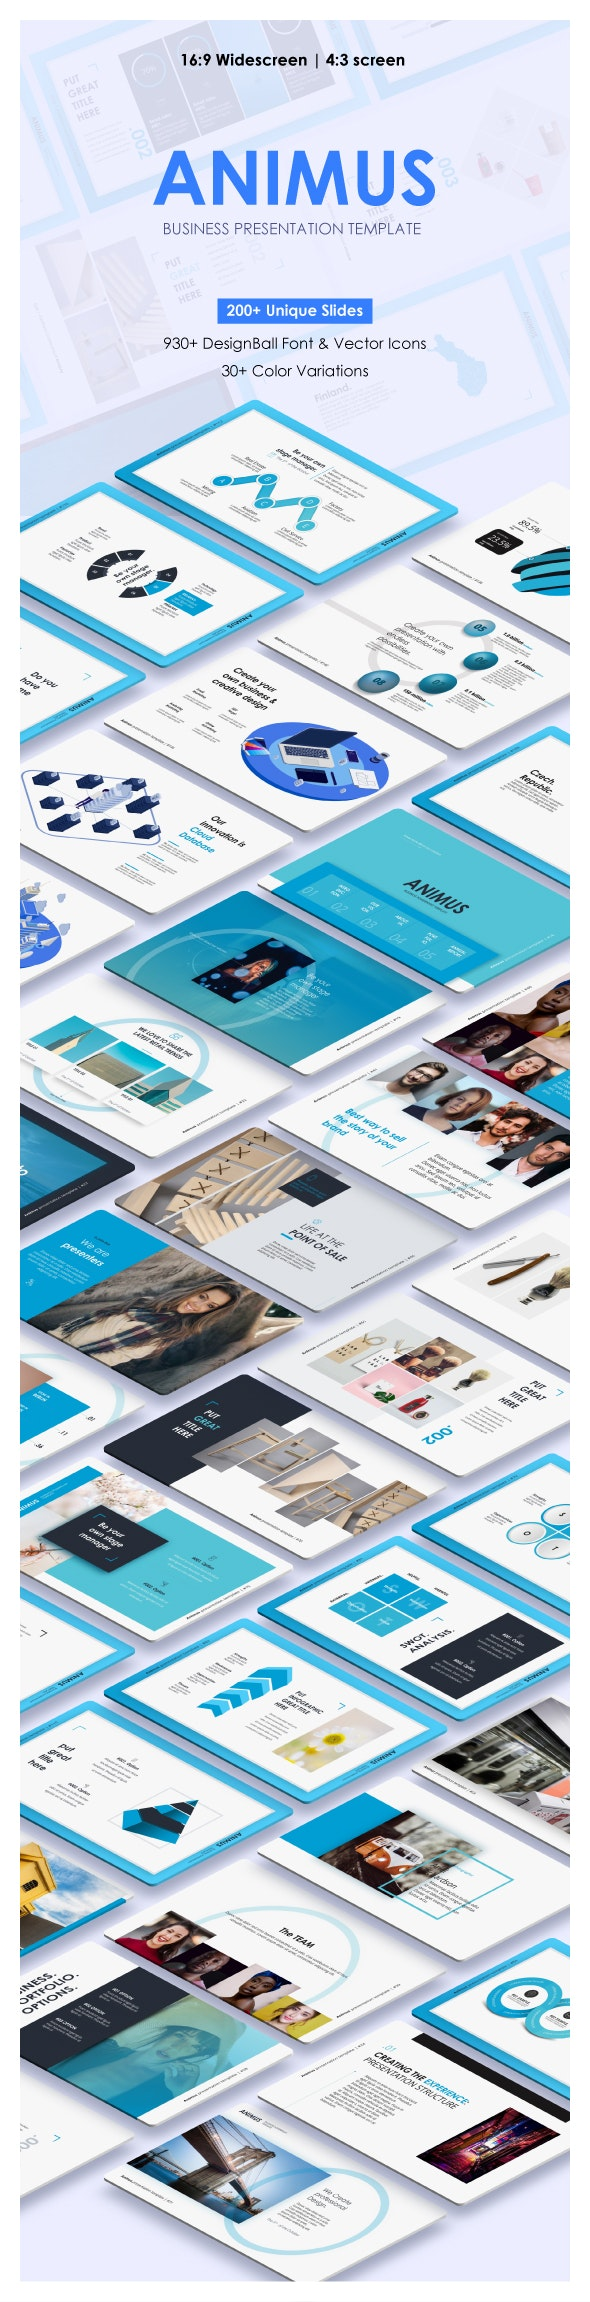 Animus Powerpoint Presentation Template - Business PowerPoint Templates